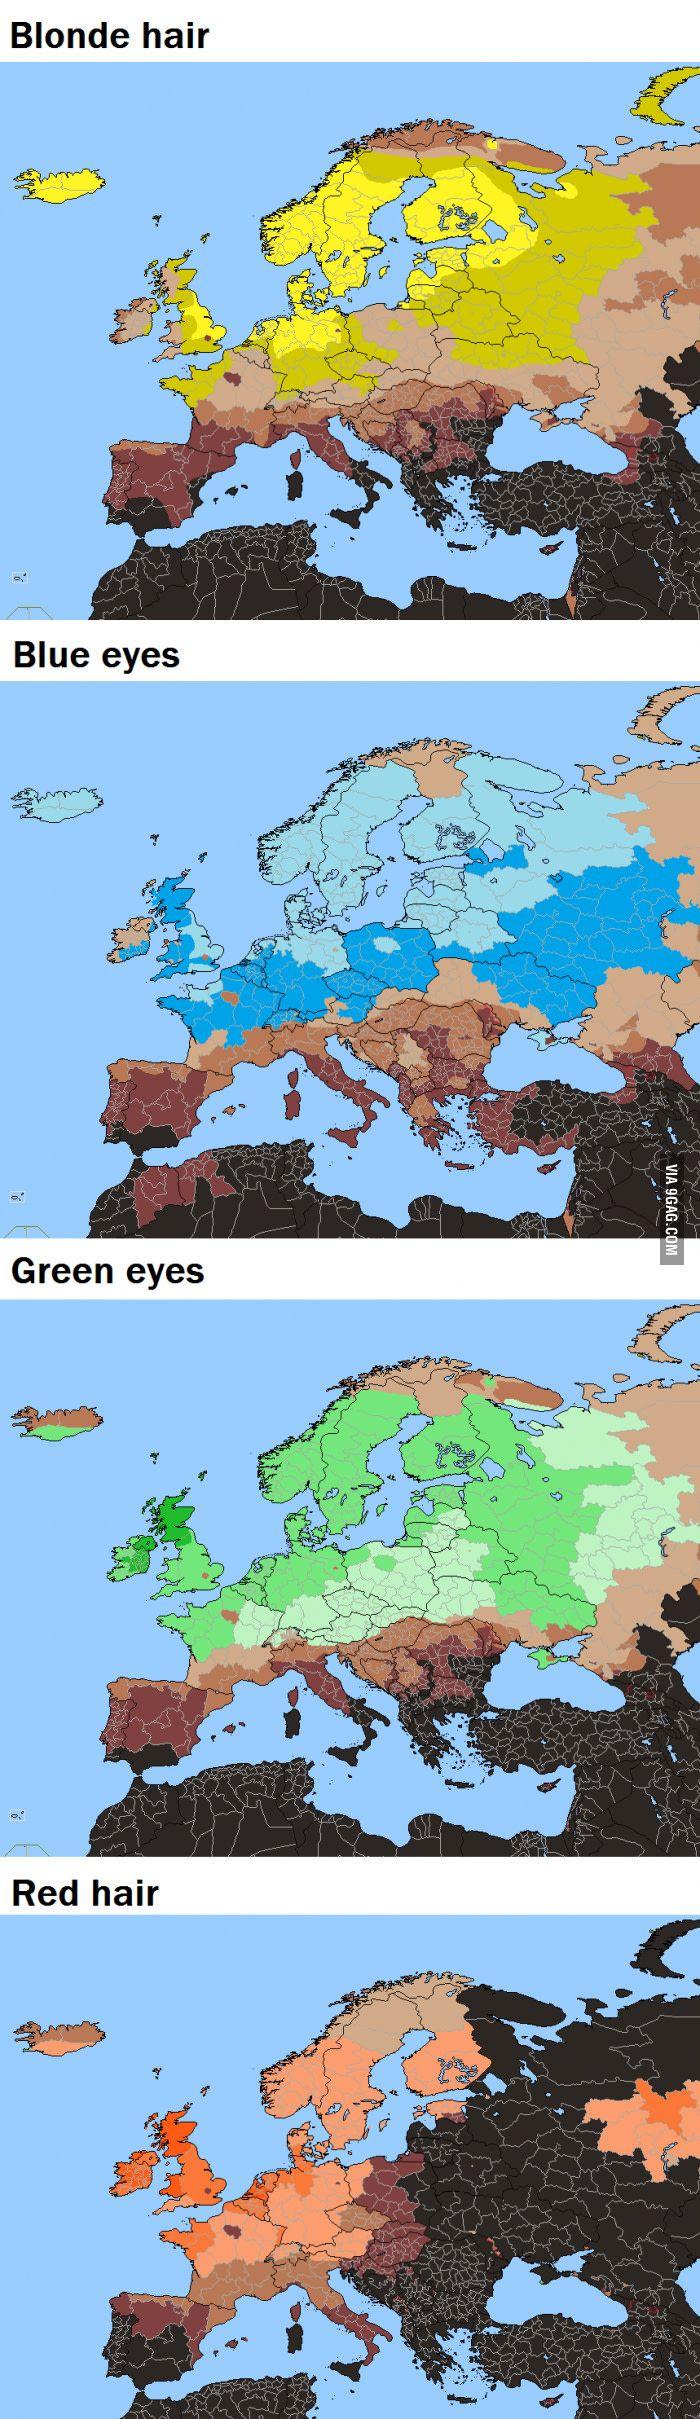 North America Map In 1750%0A Blonde hair  red hair  blue eyes  green eyes     In Europe